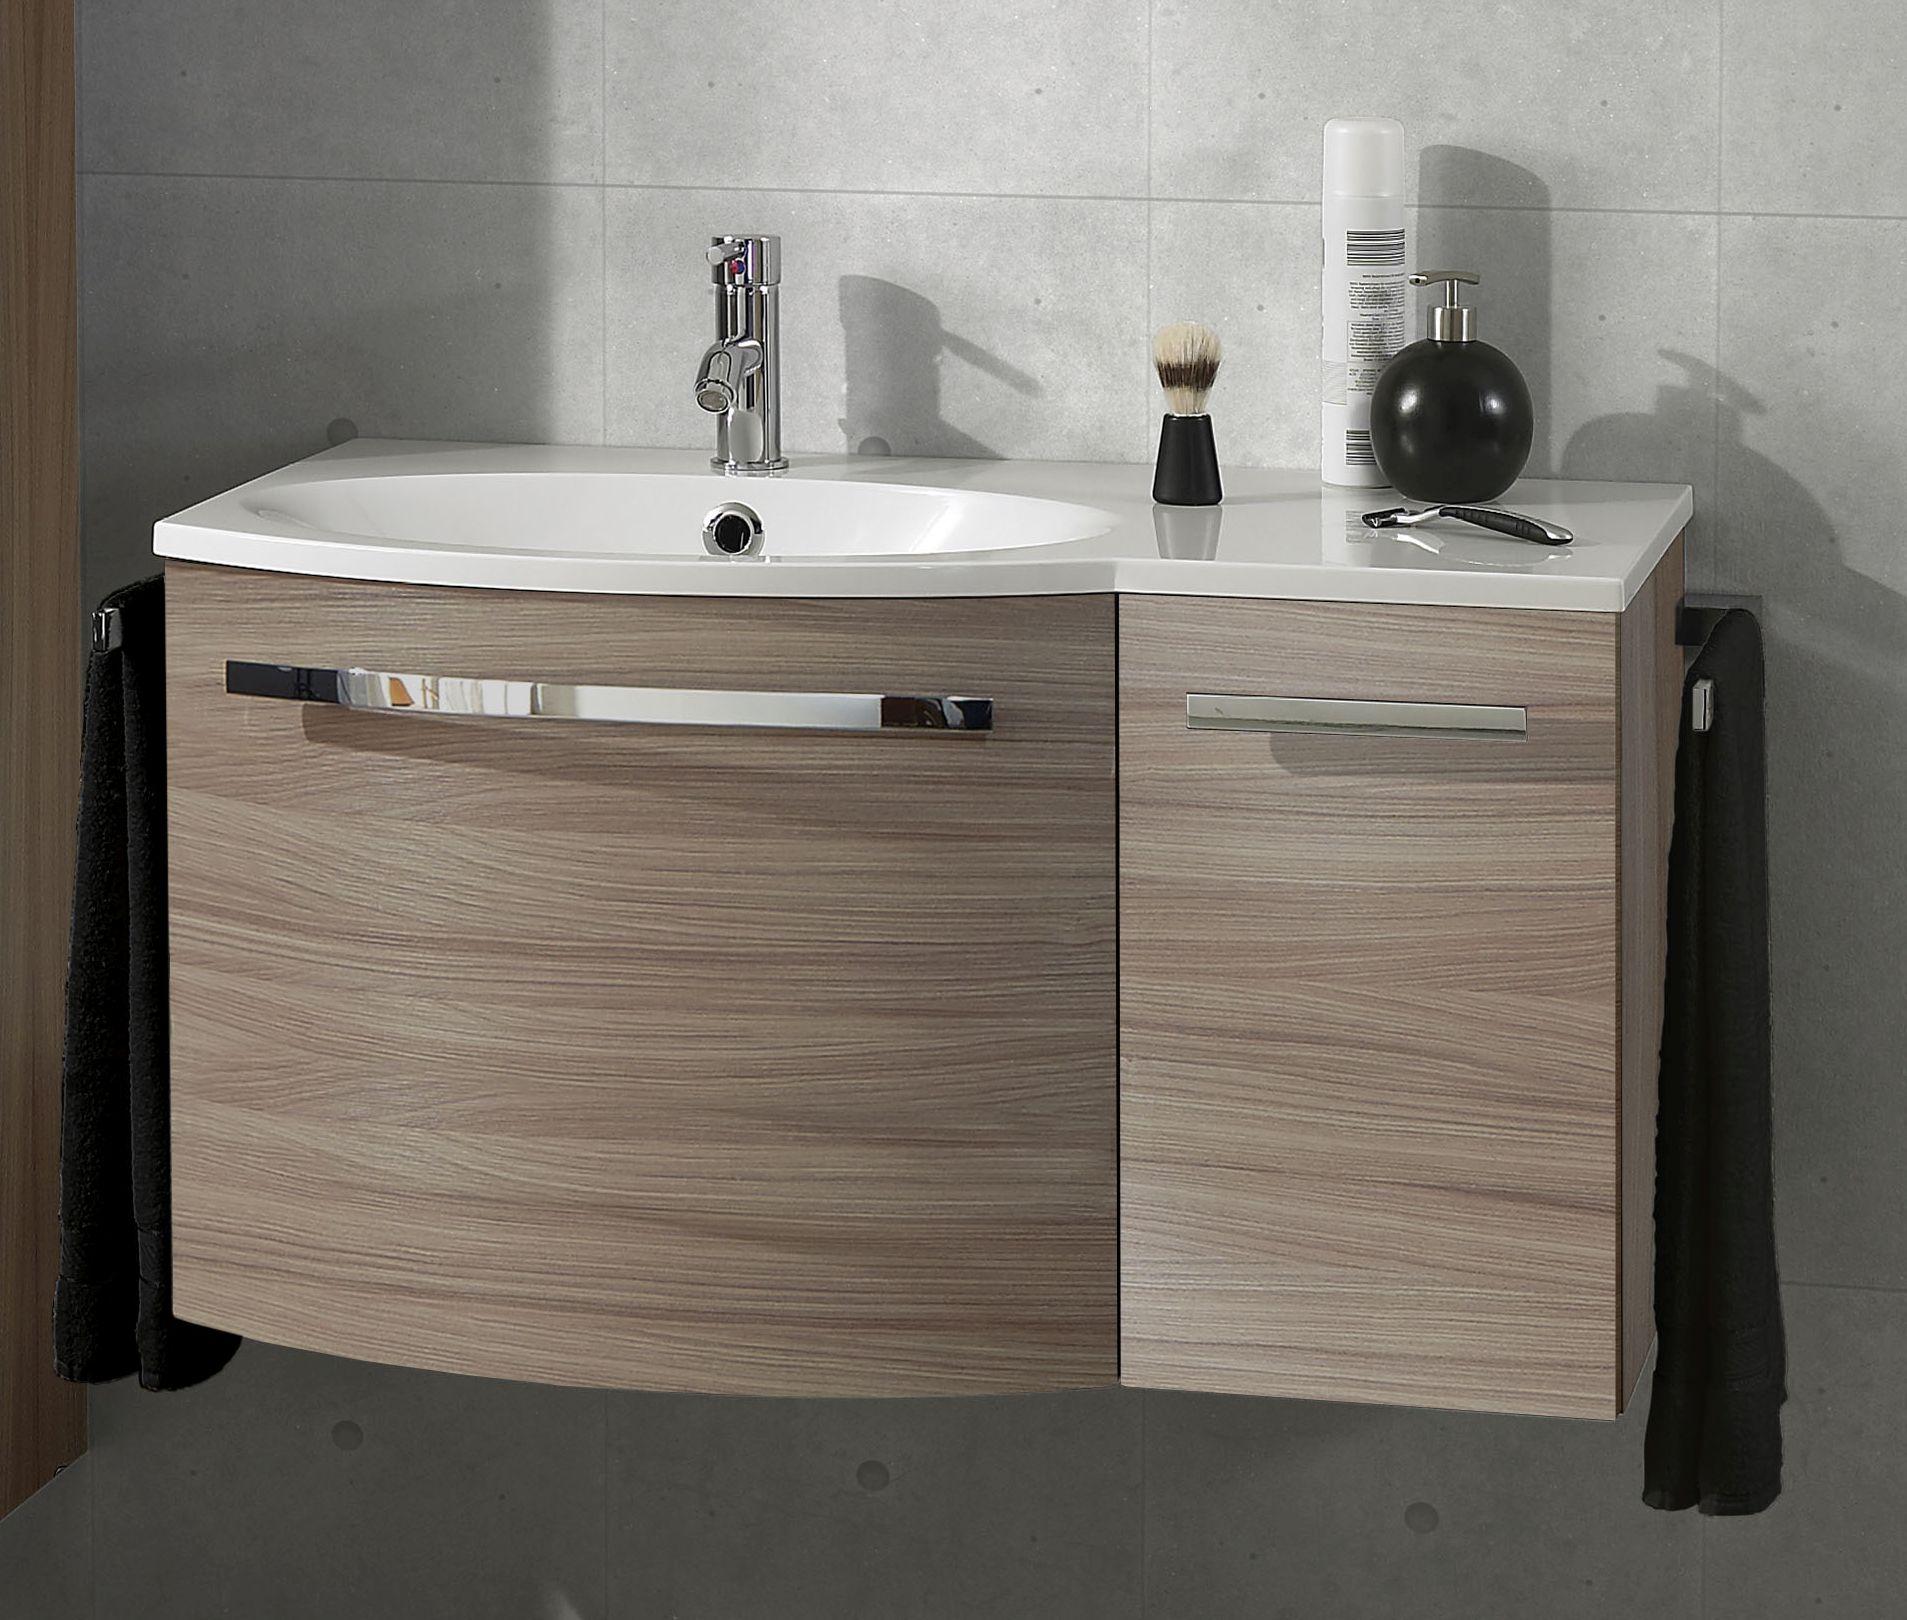 marlin bad 3090 cosmo block 90 cm konfigurator g nstig kaufen m bel universum. Black Bedroom Furniture Sets. Home Design Ideas